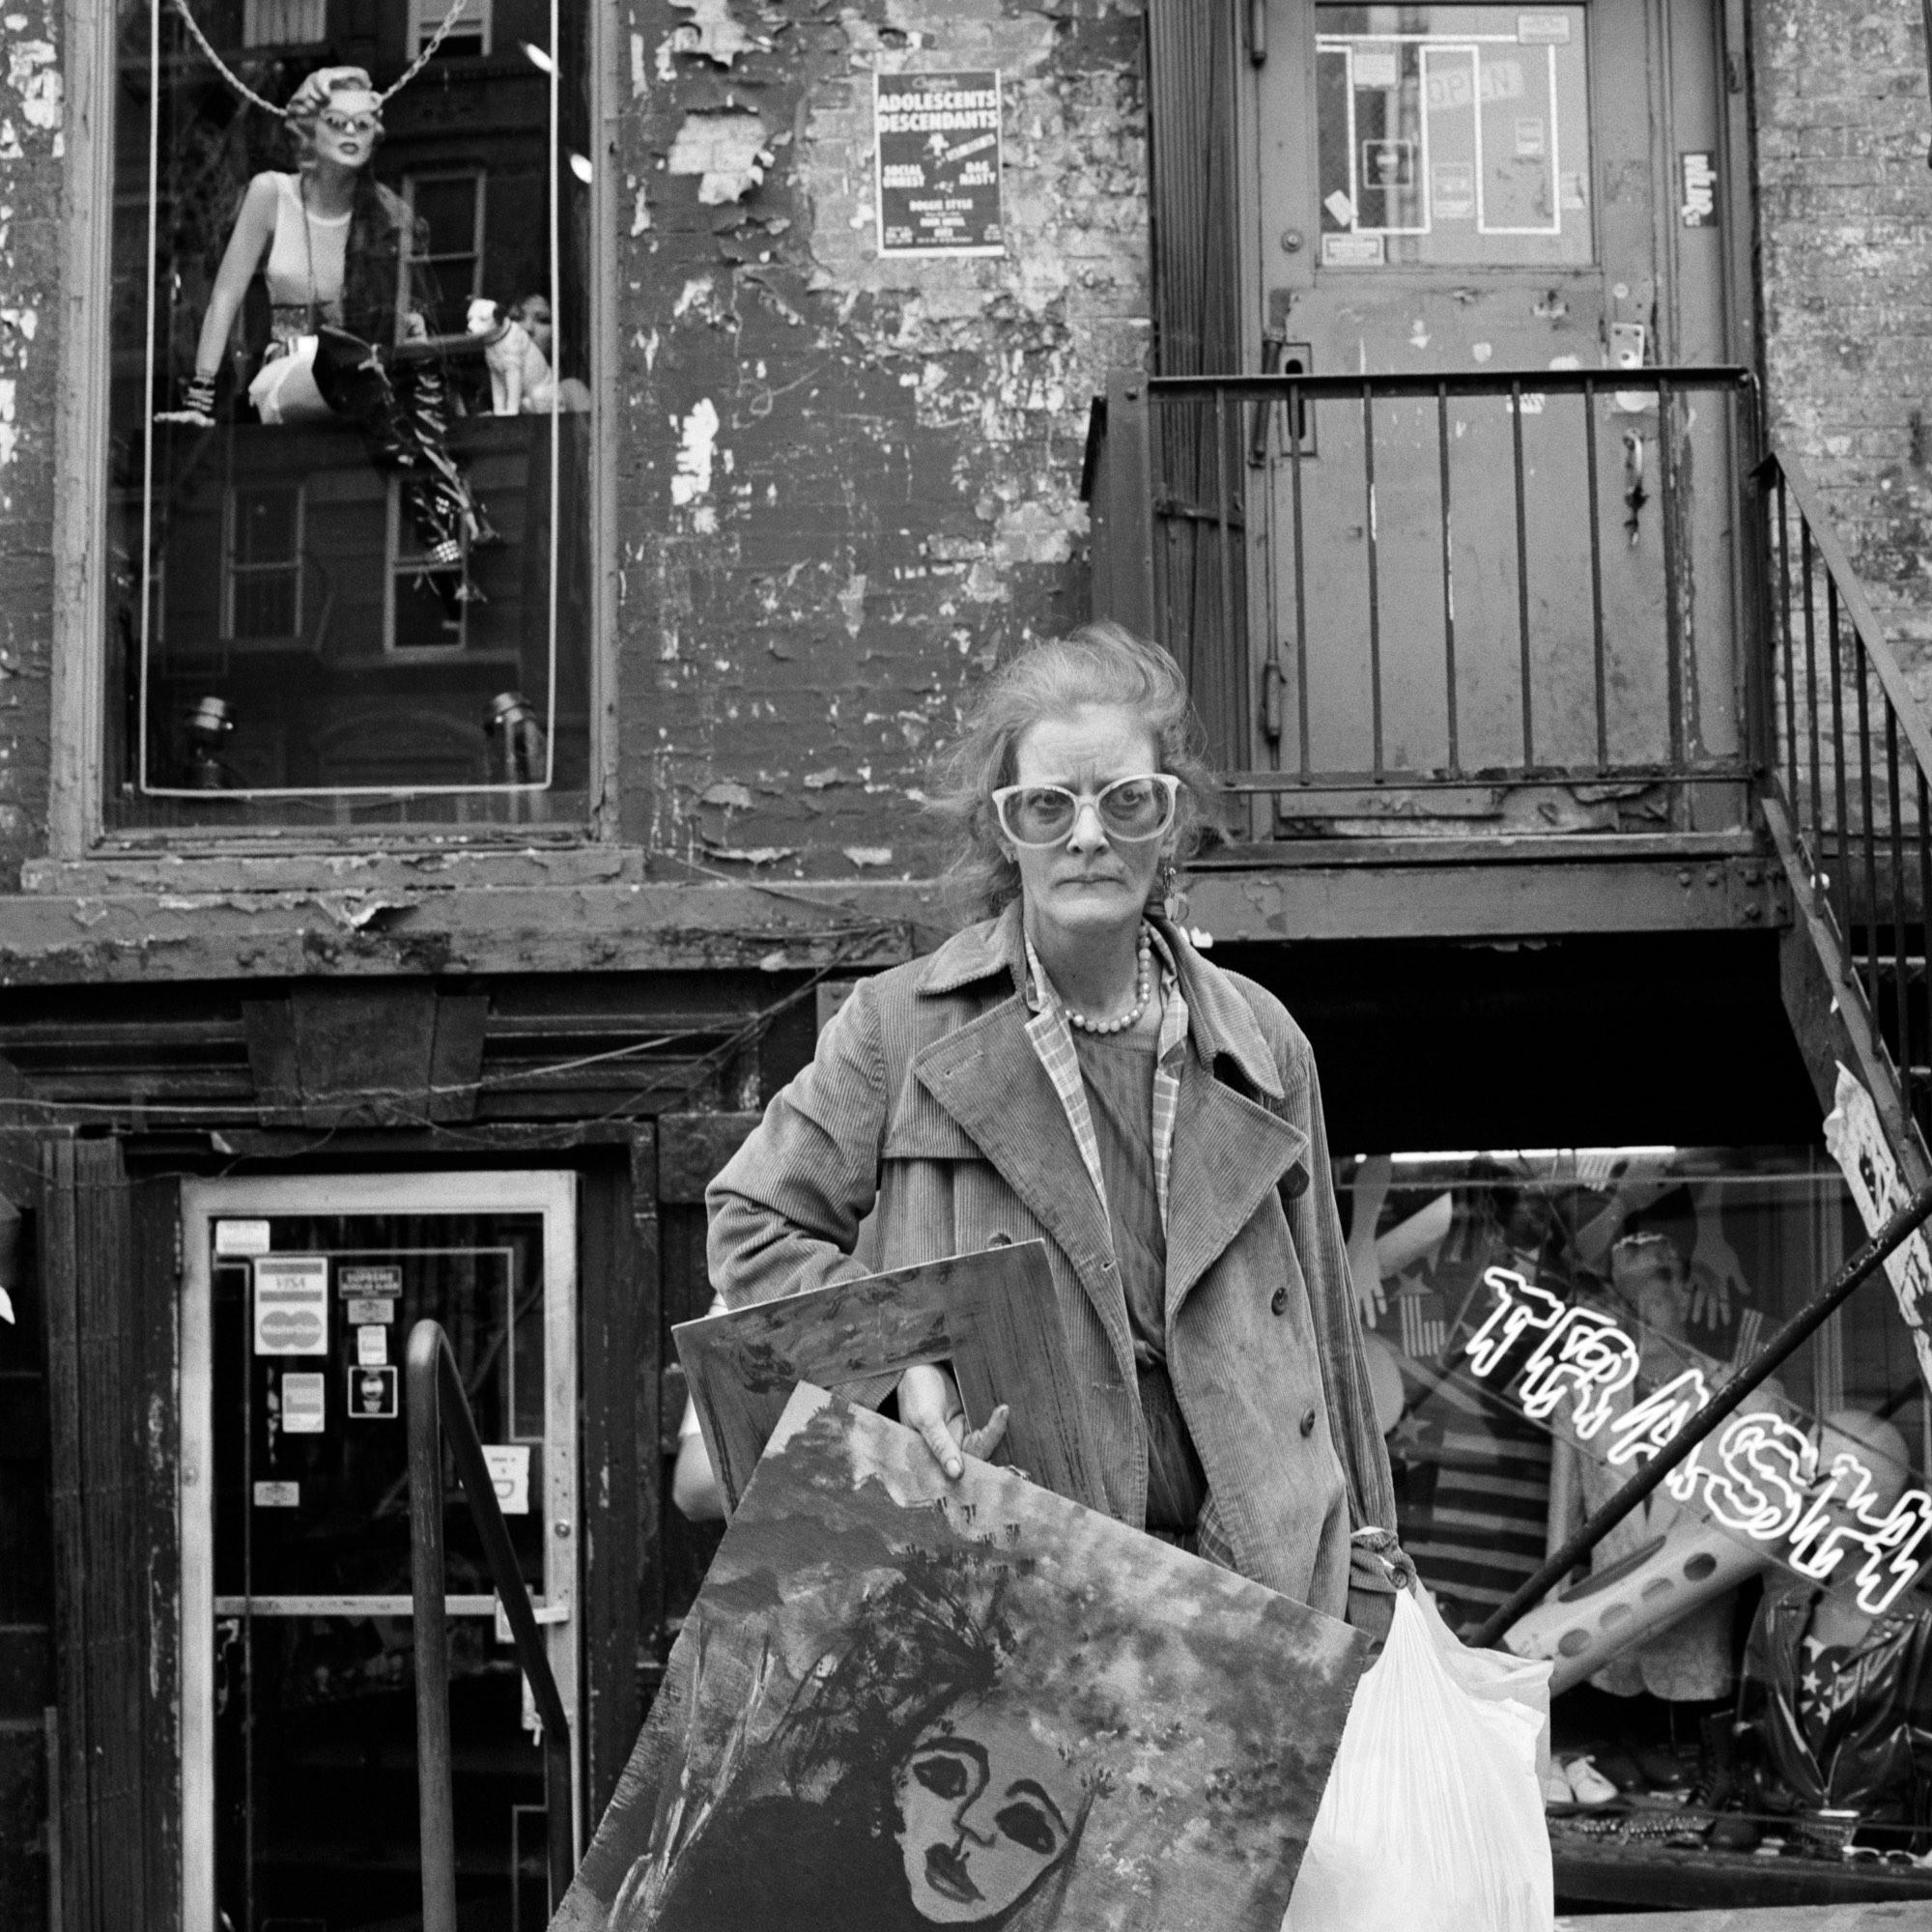 Rosalind Fox Solomon's surreal shots of American life